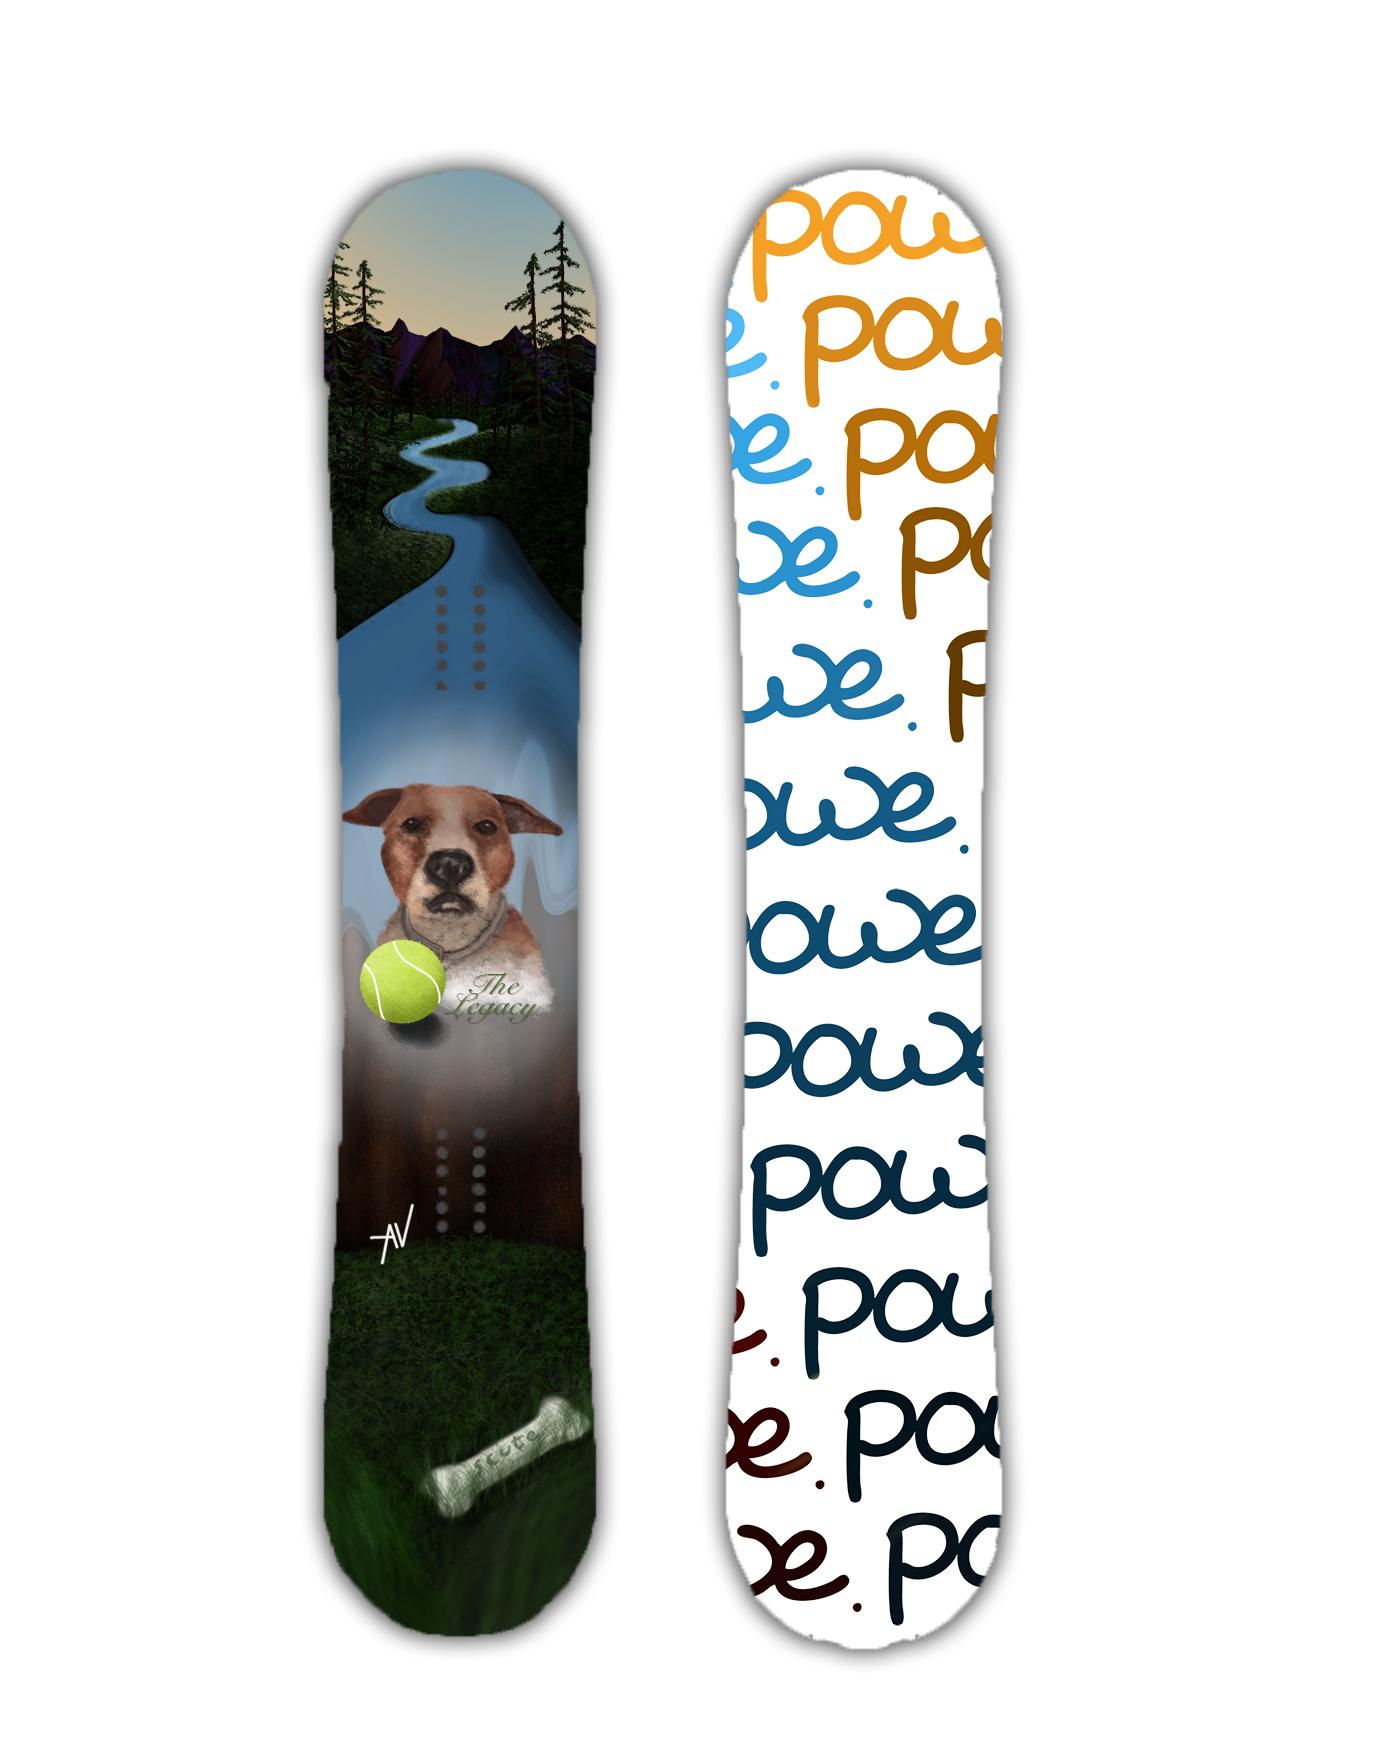 The Legacy, Powe. Snowboards, Stowe, Vt. Custom Snowbaords